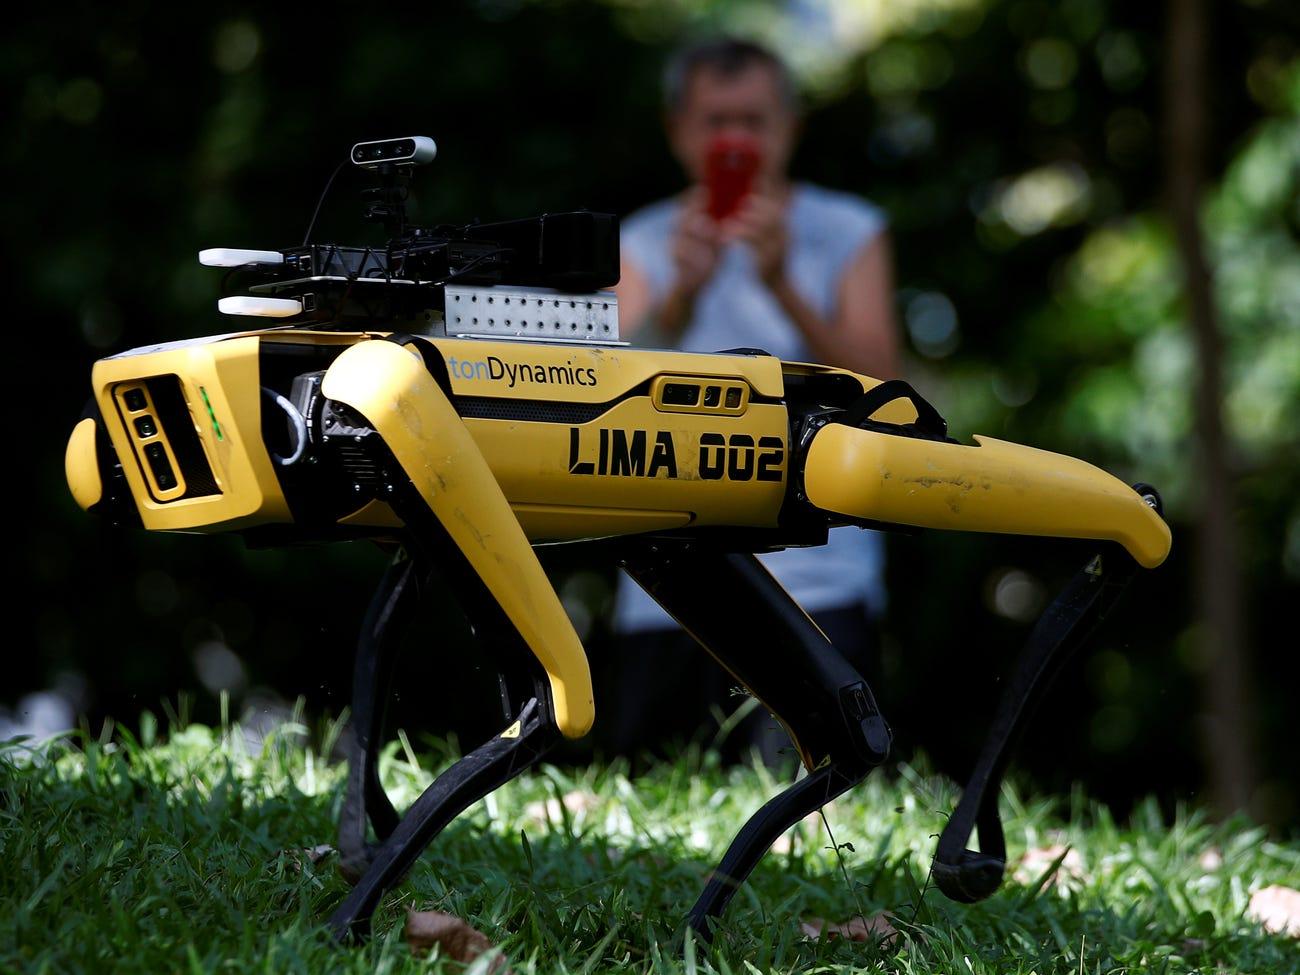 Ya es posible adquirir el robot cuadrúpedo de Boston Dynamics